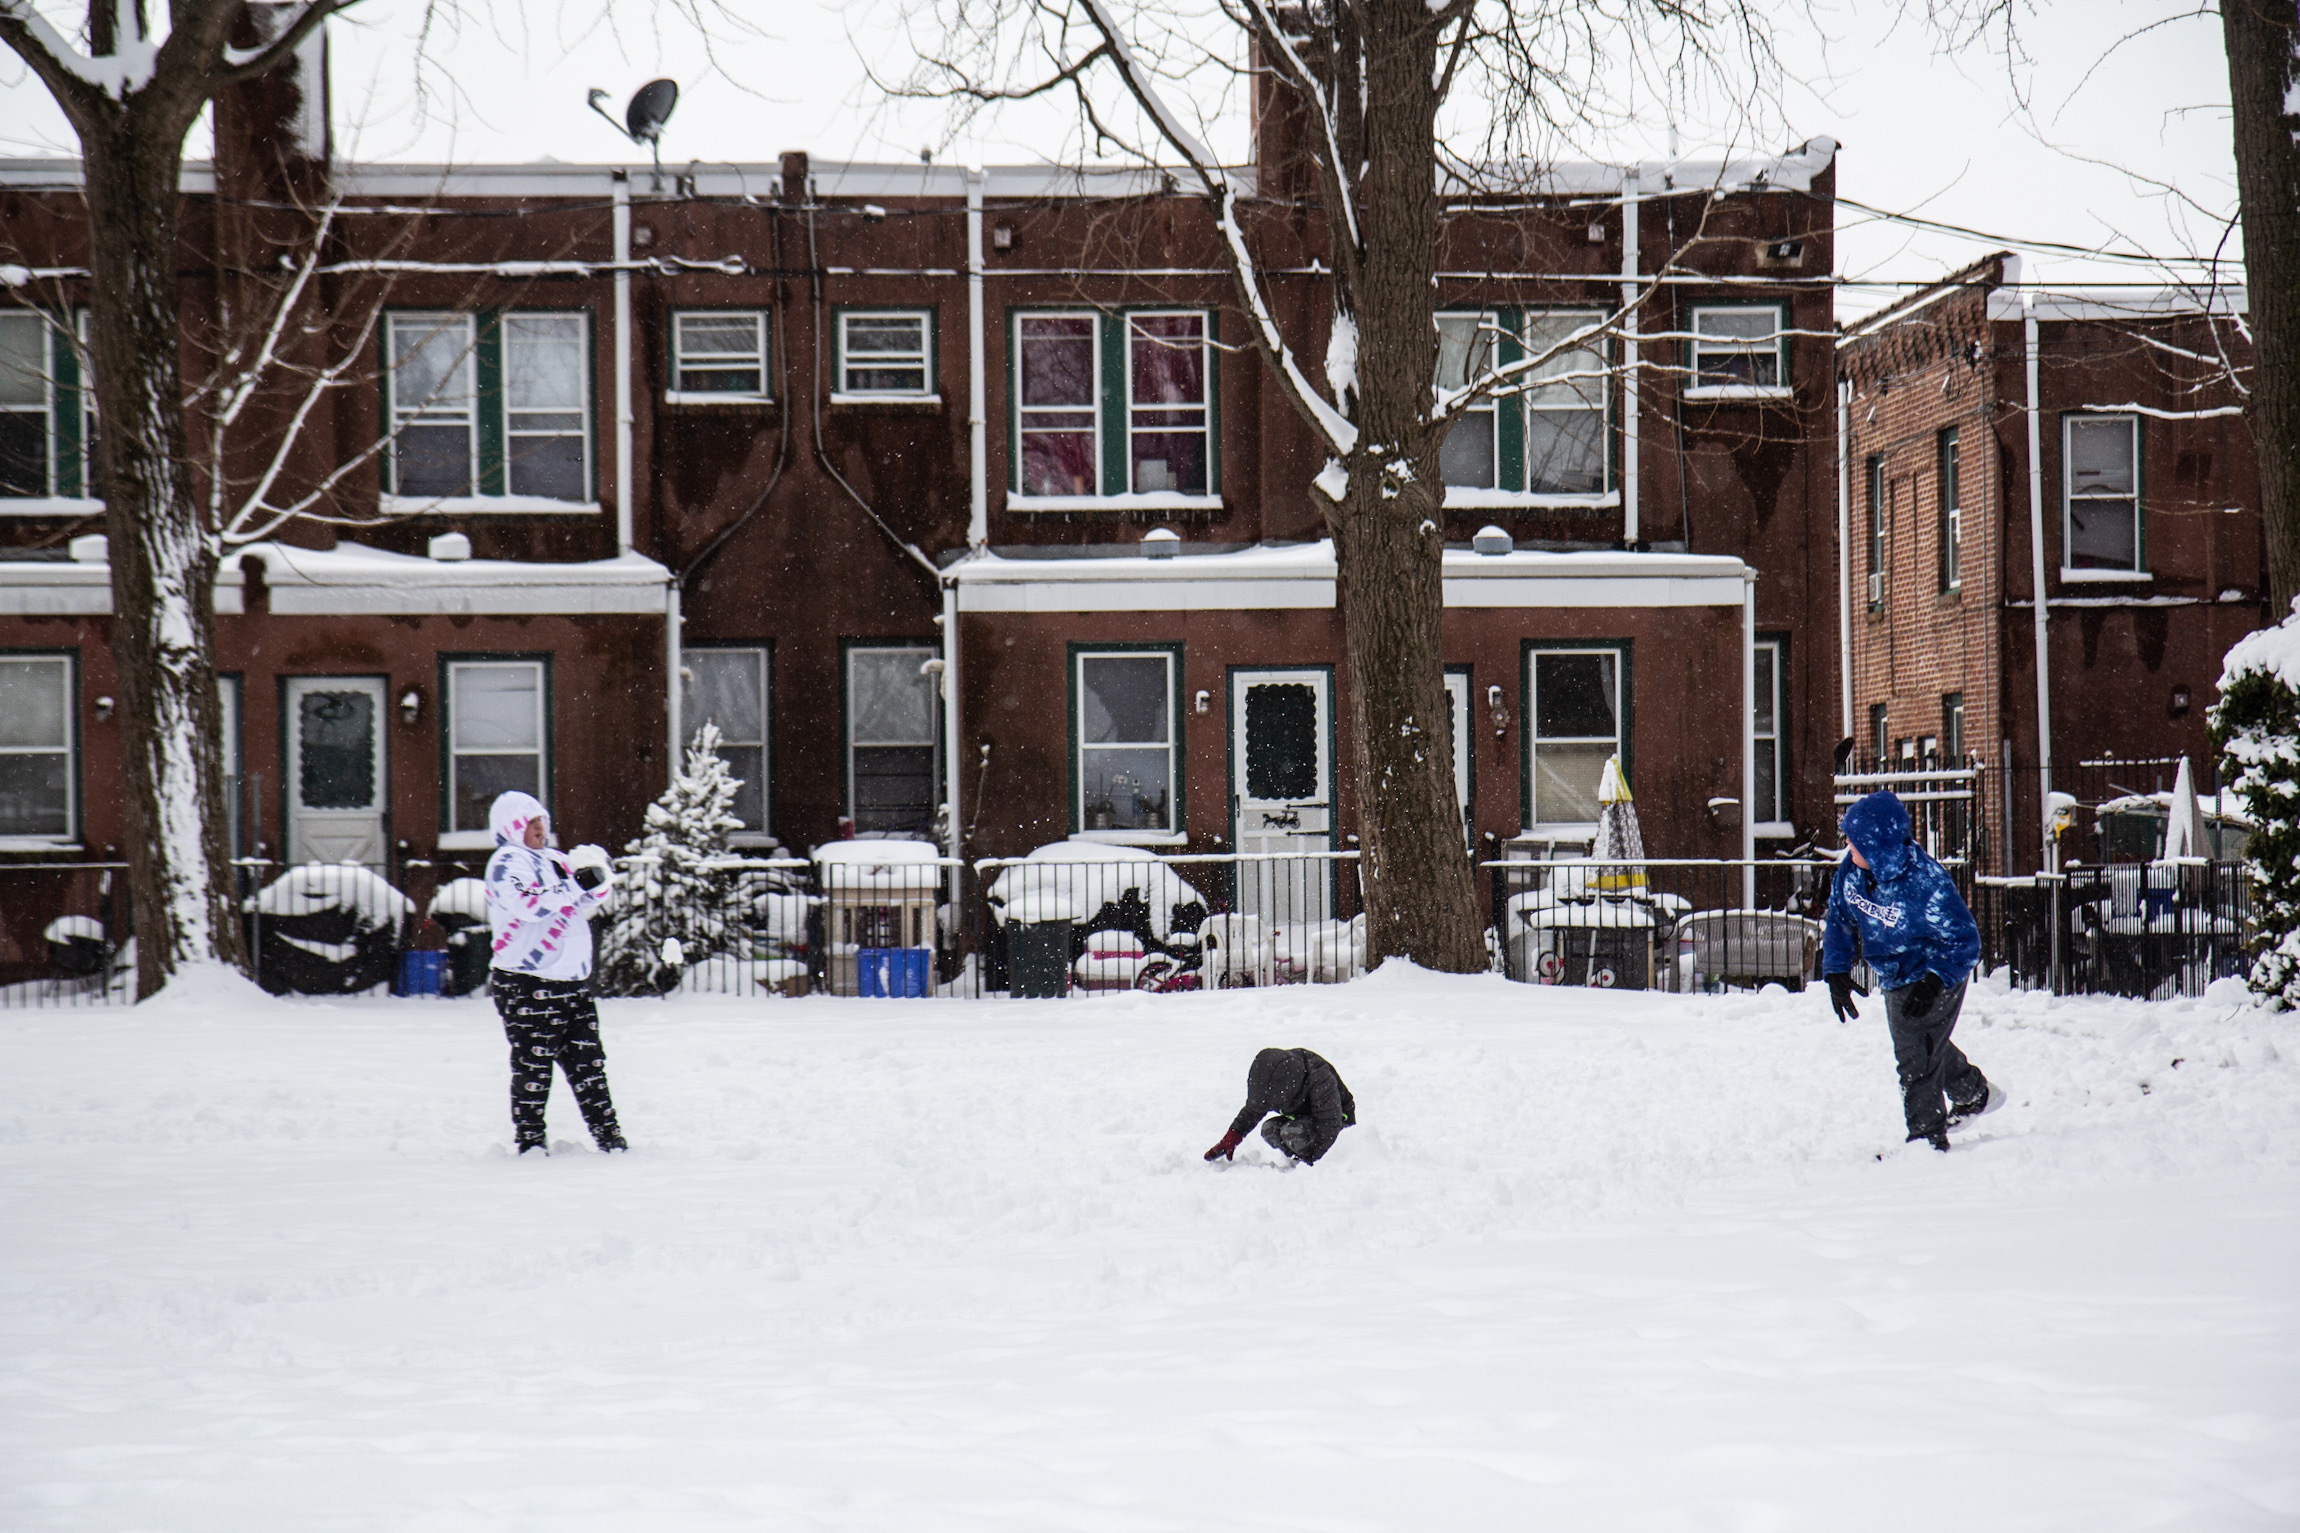 Kids toss snowballs around a courtyard in Philadelphia.